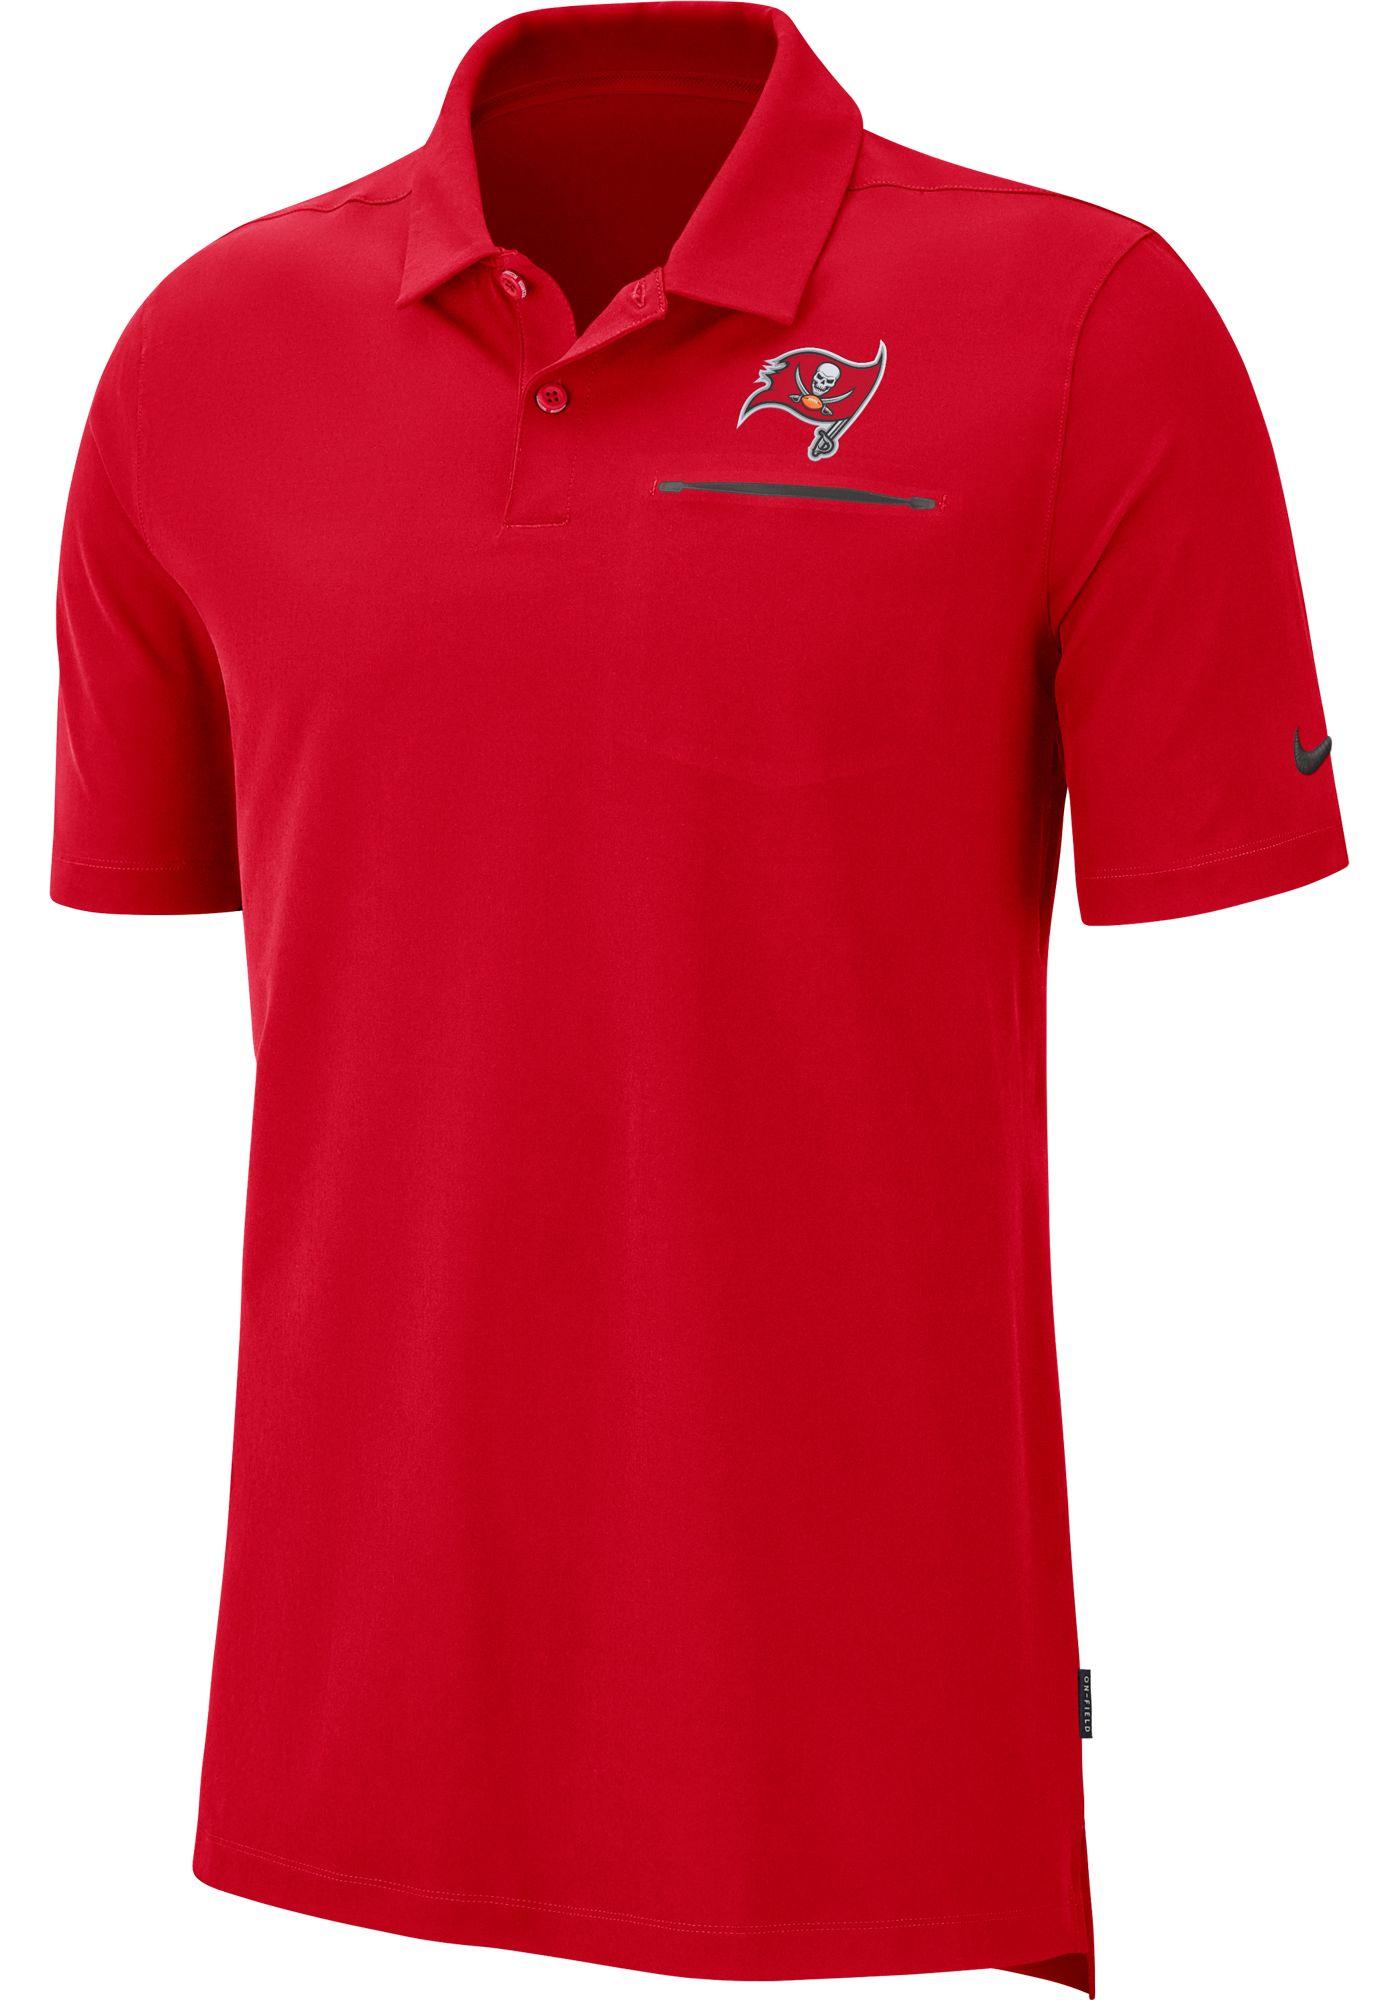 Nike Men's Tampa Bay Buccaneers Sideline Elite Performance Red Polo